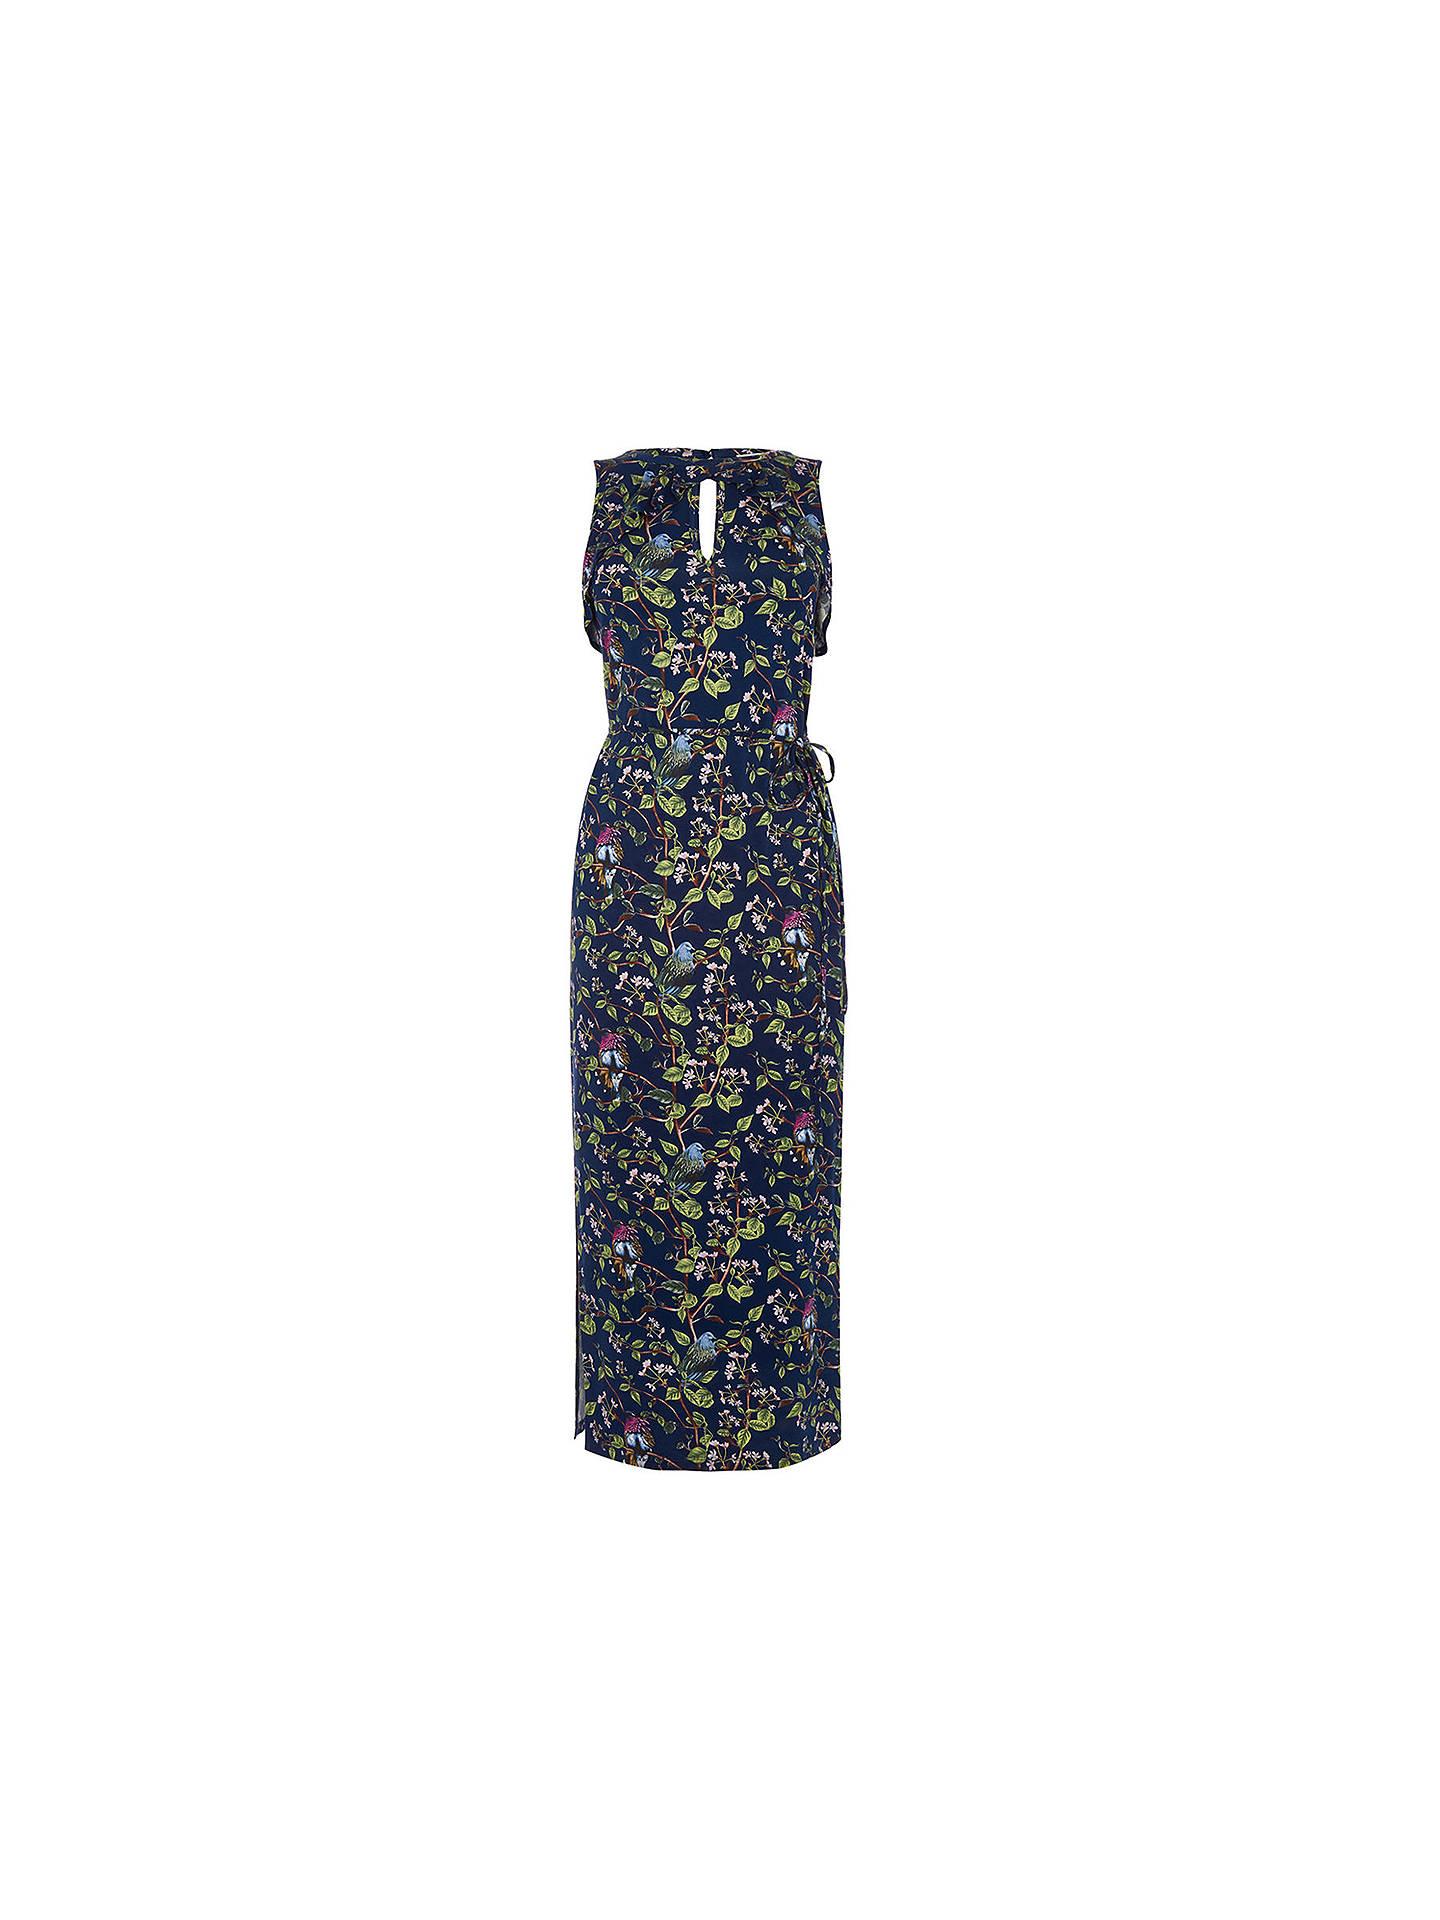 8b07510e2ca5 ... Buy Oasis Topaz Bird Print Midi Dress, Navy, XS Online at johnlewis.com  ...